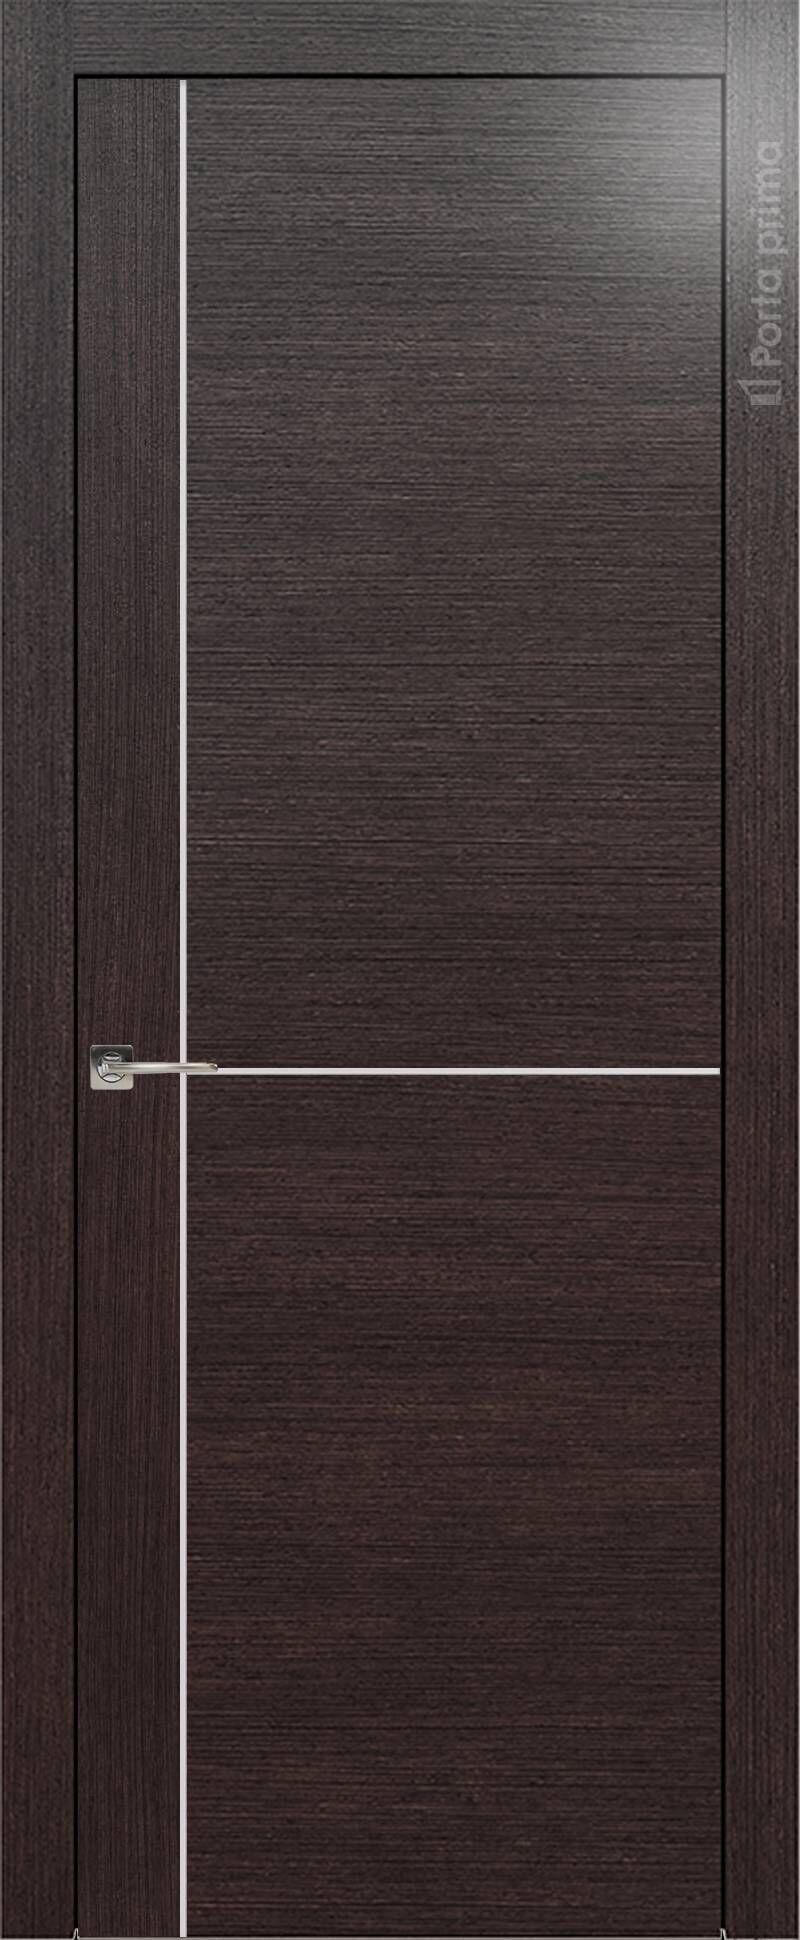 Tivoli Е-3 цвет - Венге Шоколад Без стекла (ДГ)